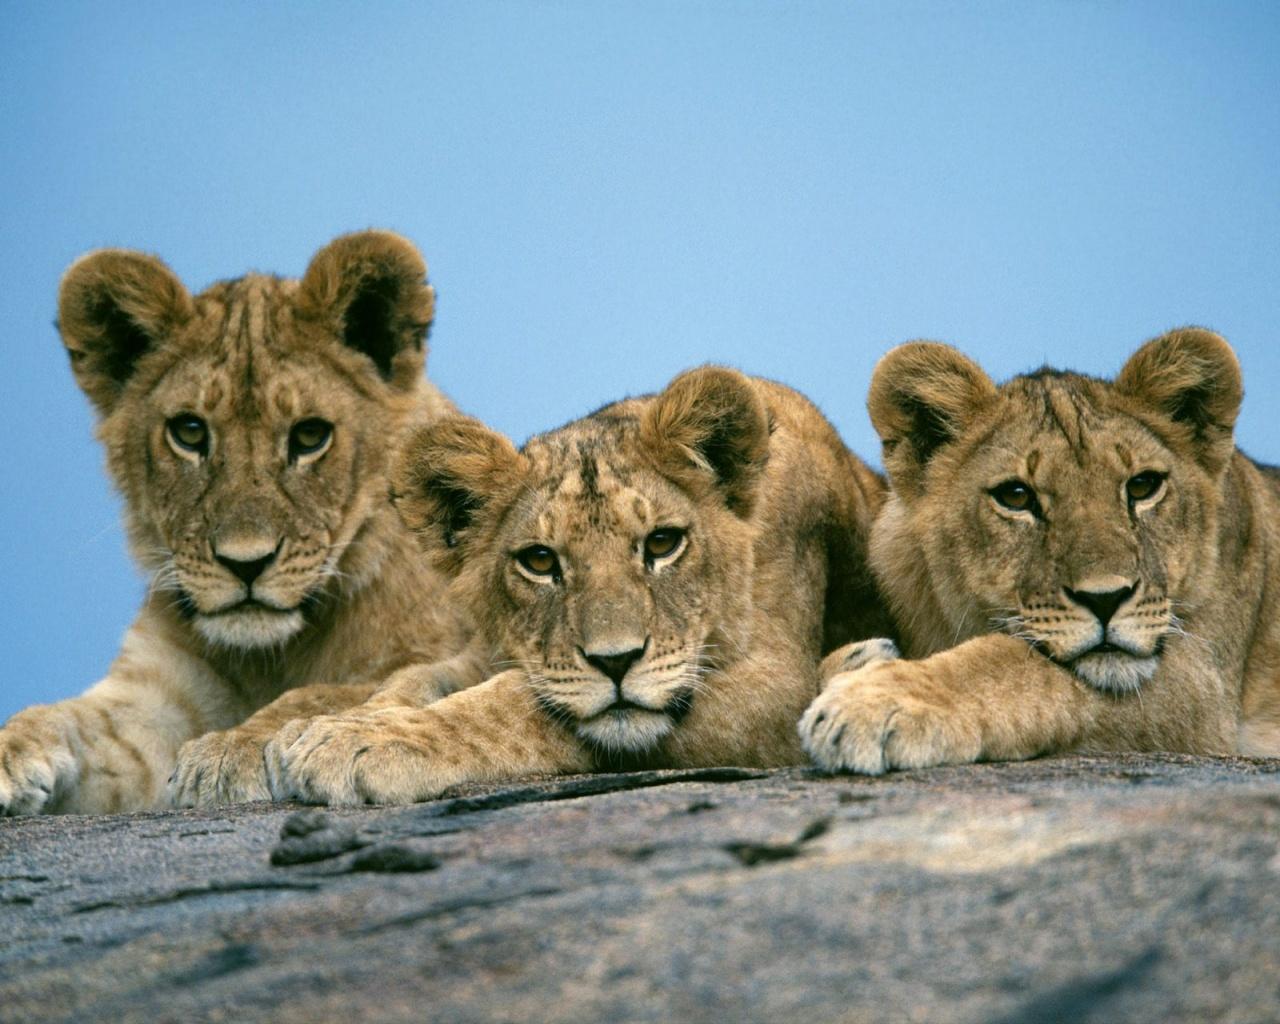 1280x1024 Lion cubs desktop PC and Mac wallpaper 1280x1024